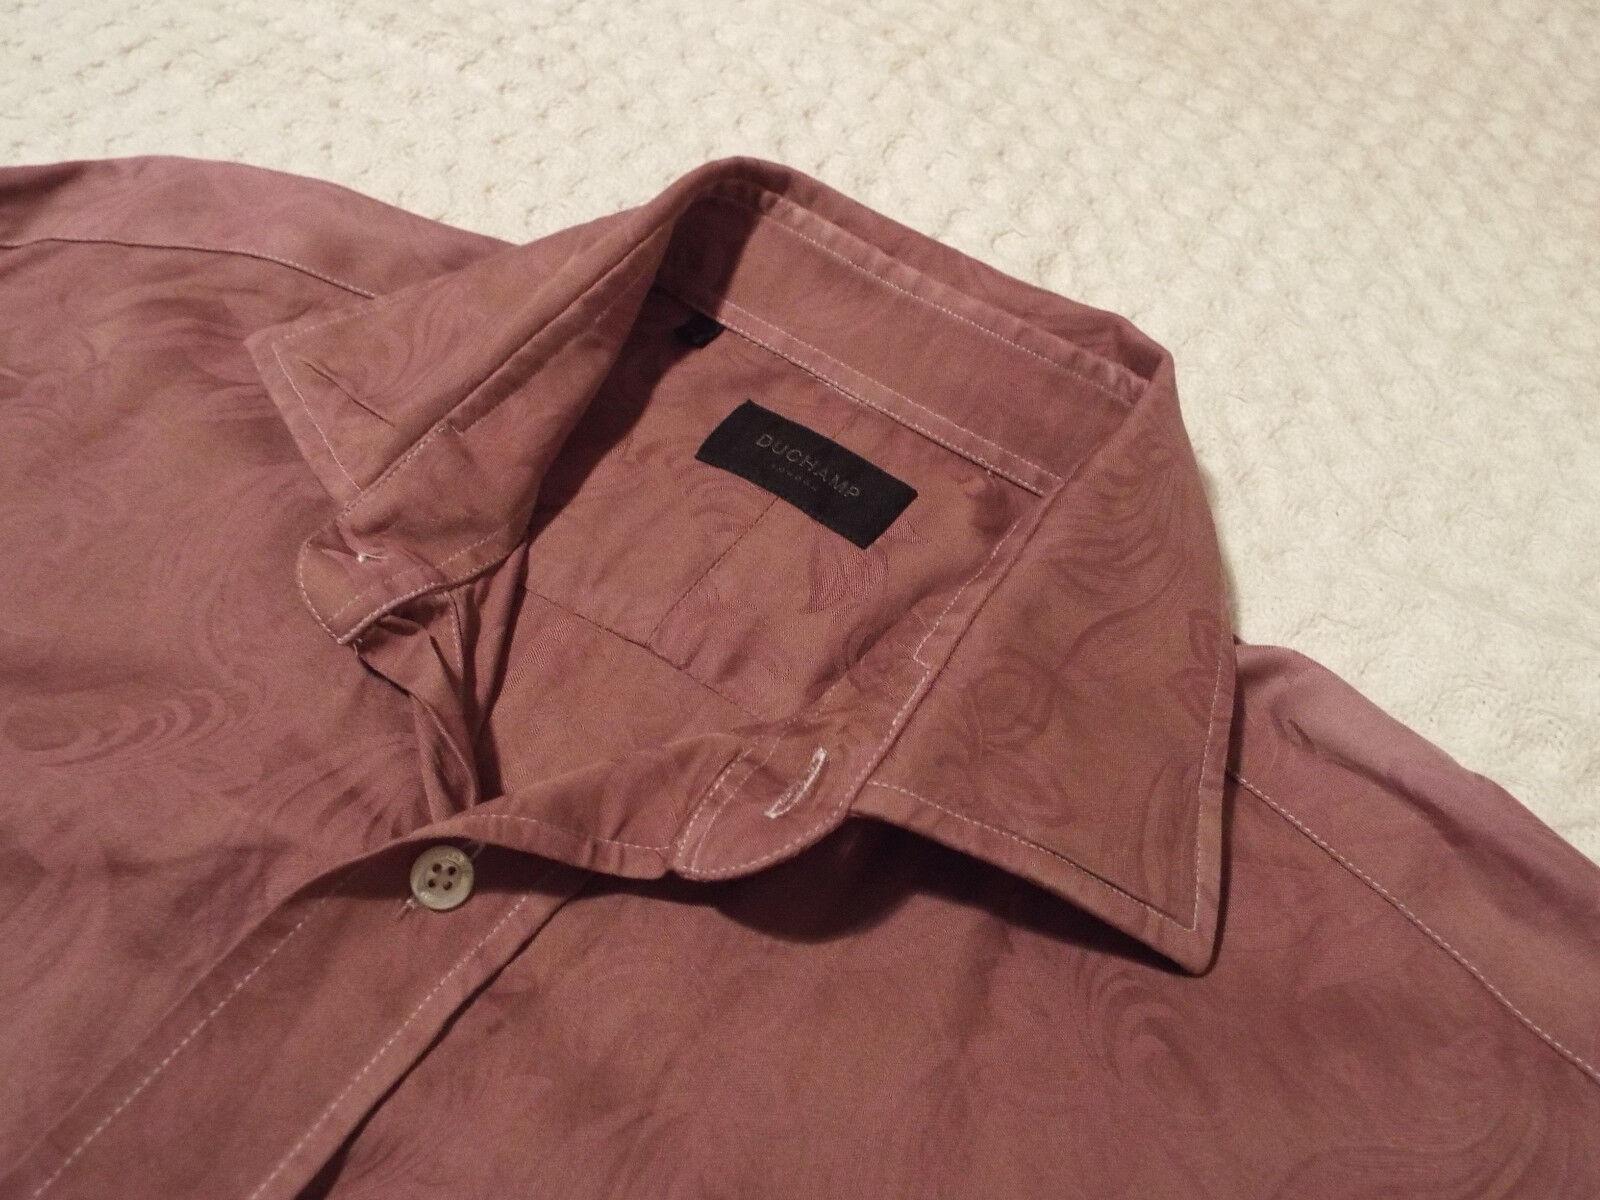 DUCHAMP Mens Shirt  Size 16  (CHEST 42 )  RRP + COOL FLORAL JACQUARD